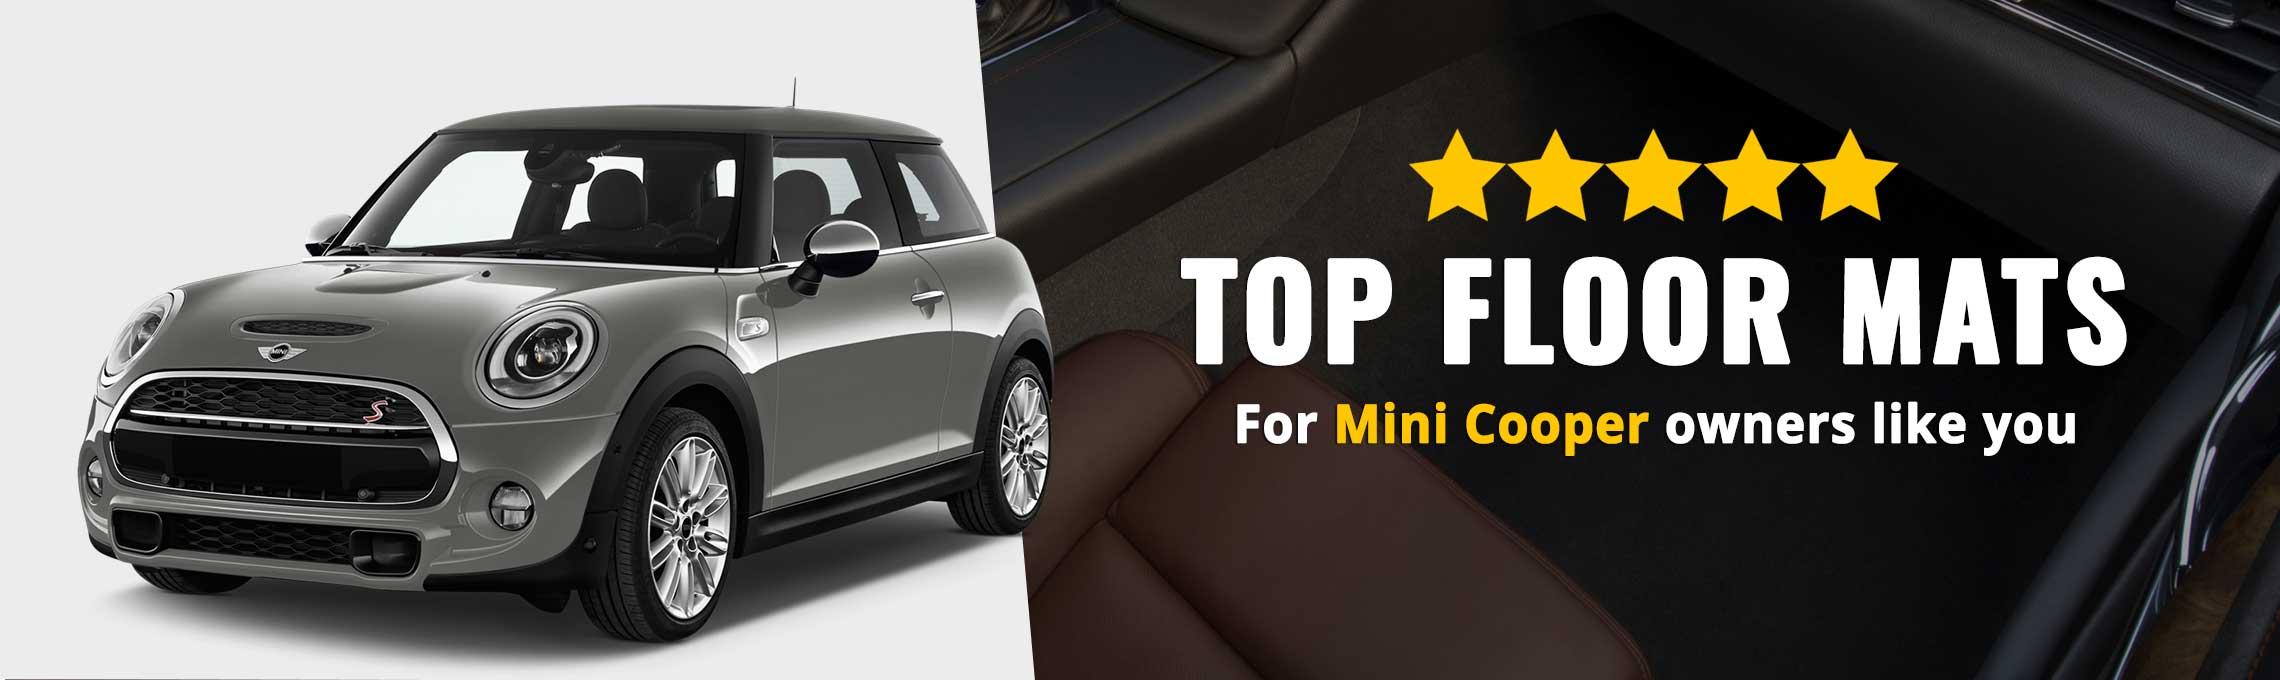 Mini Cooper Floor Mats | Custom Mini Cooper Floor Mats & Liners